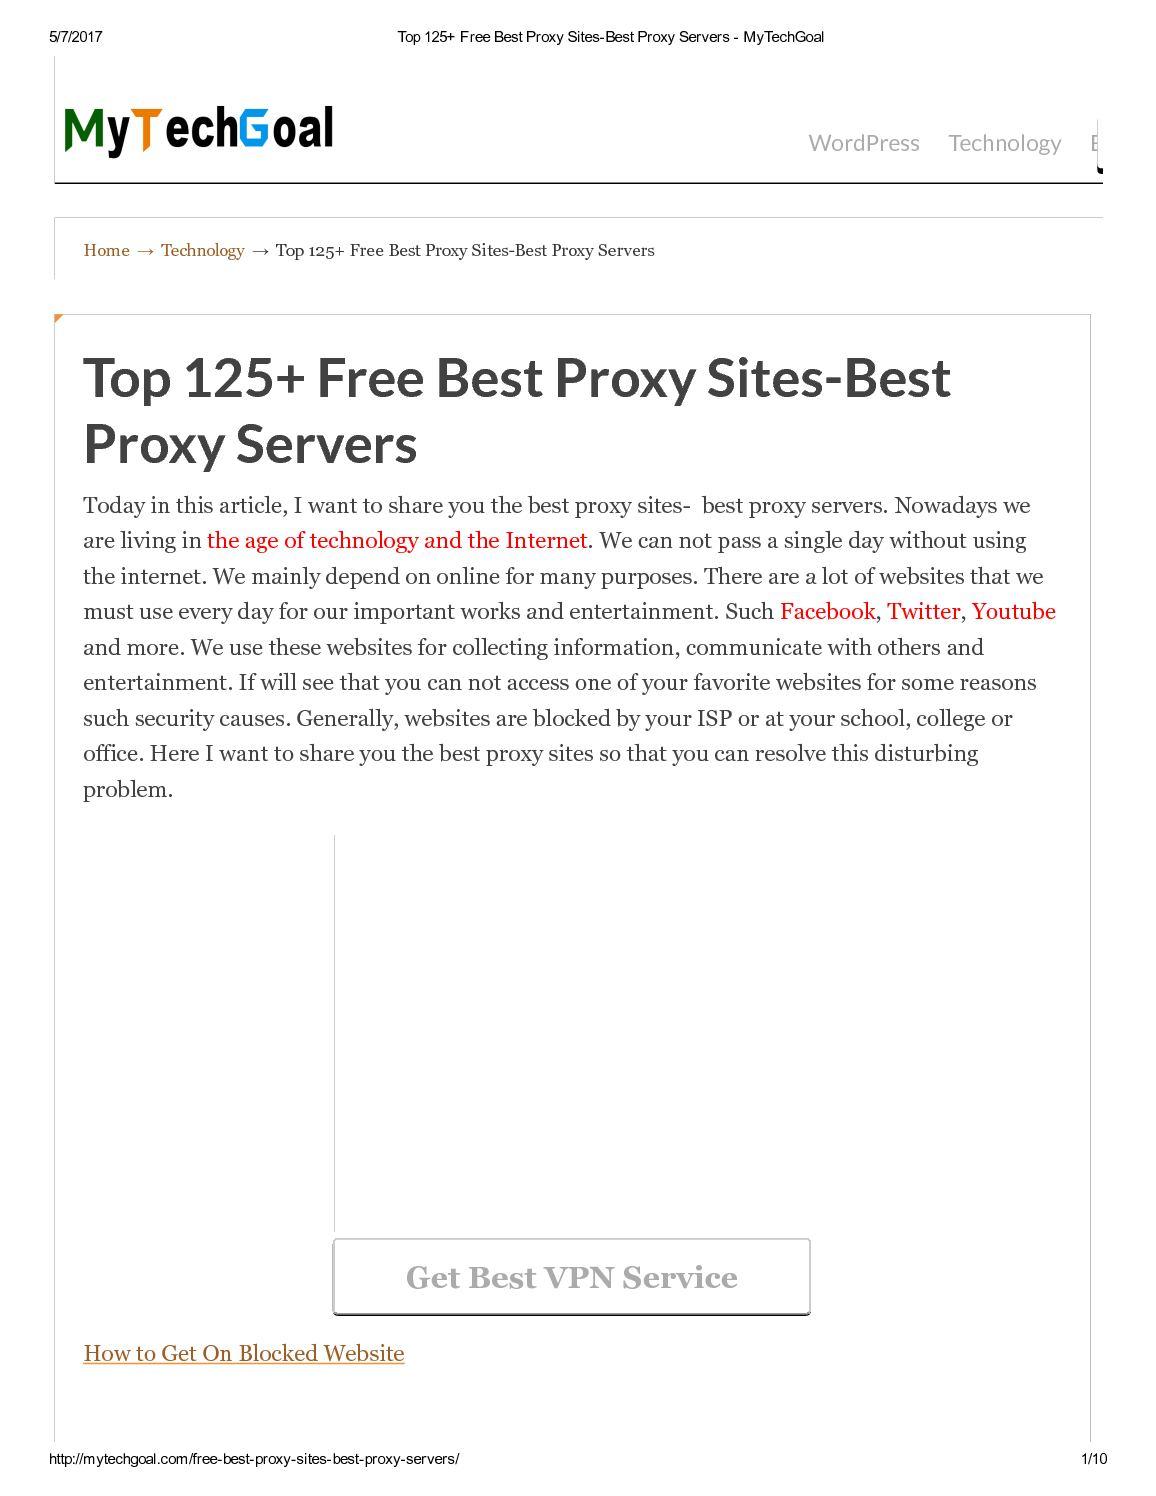 Web app proxy server